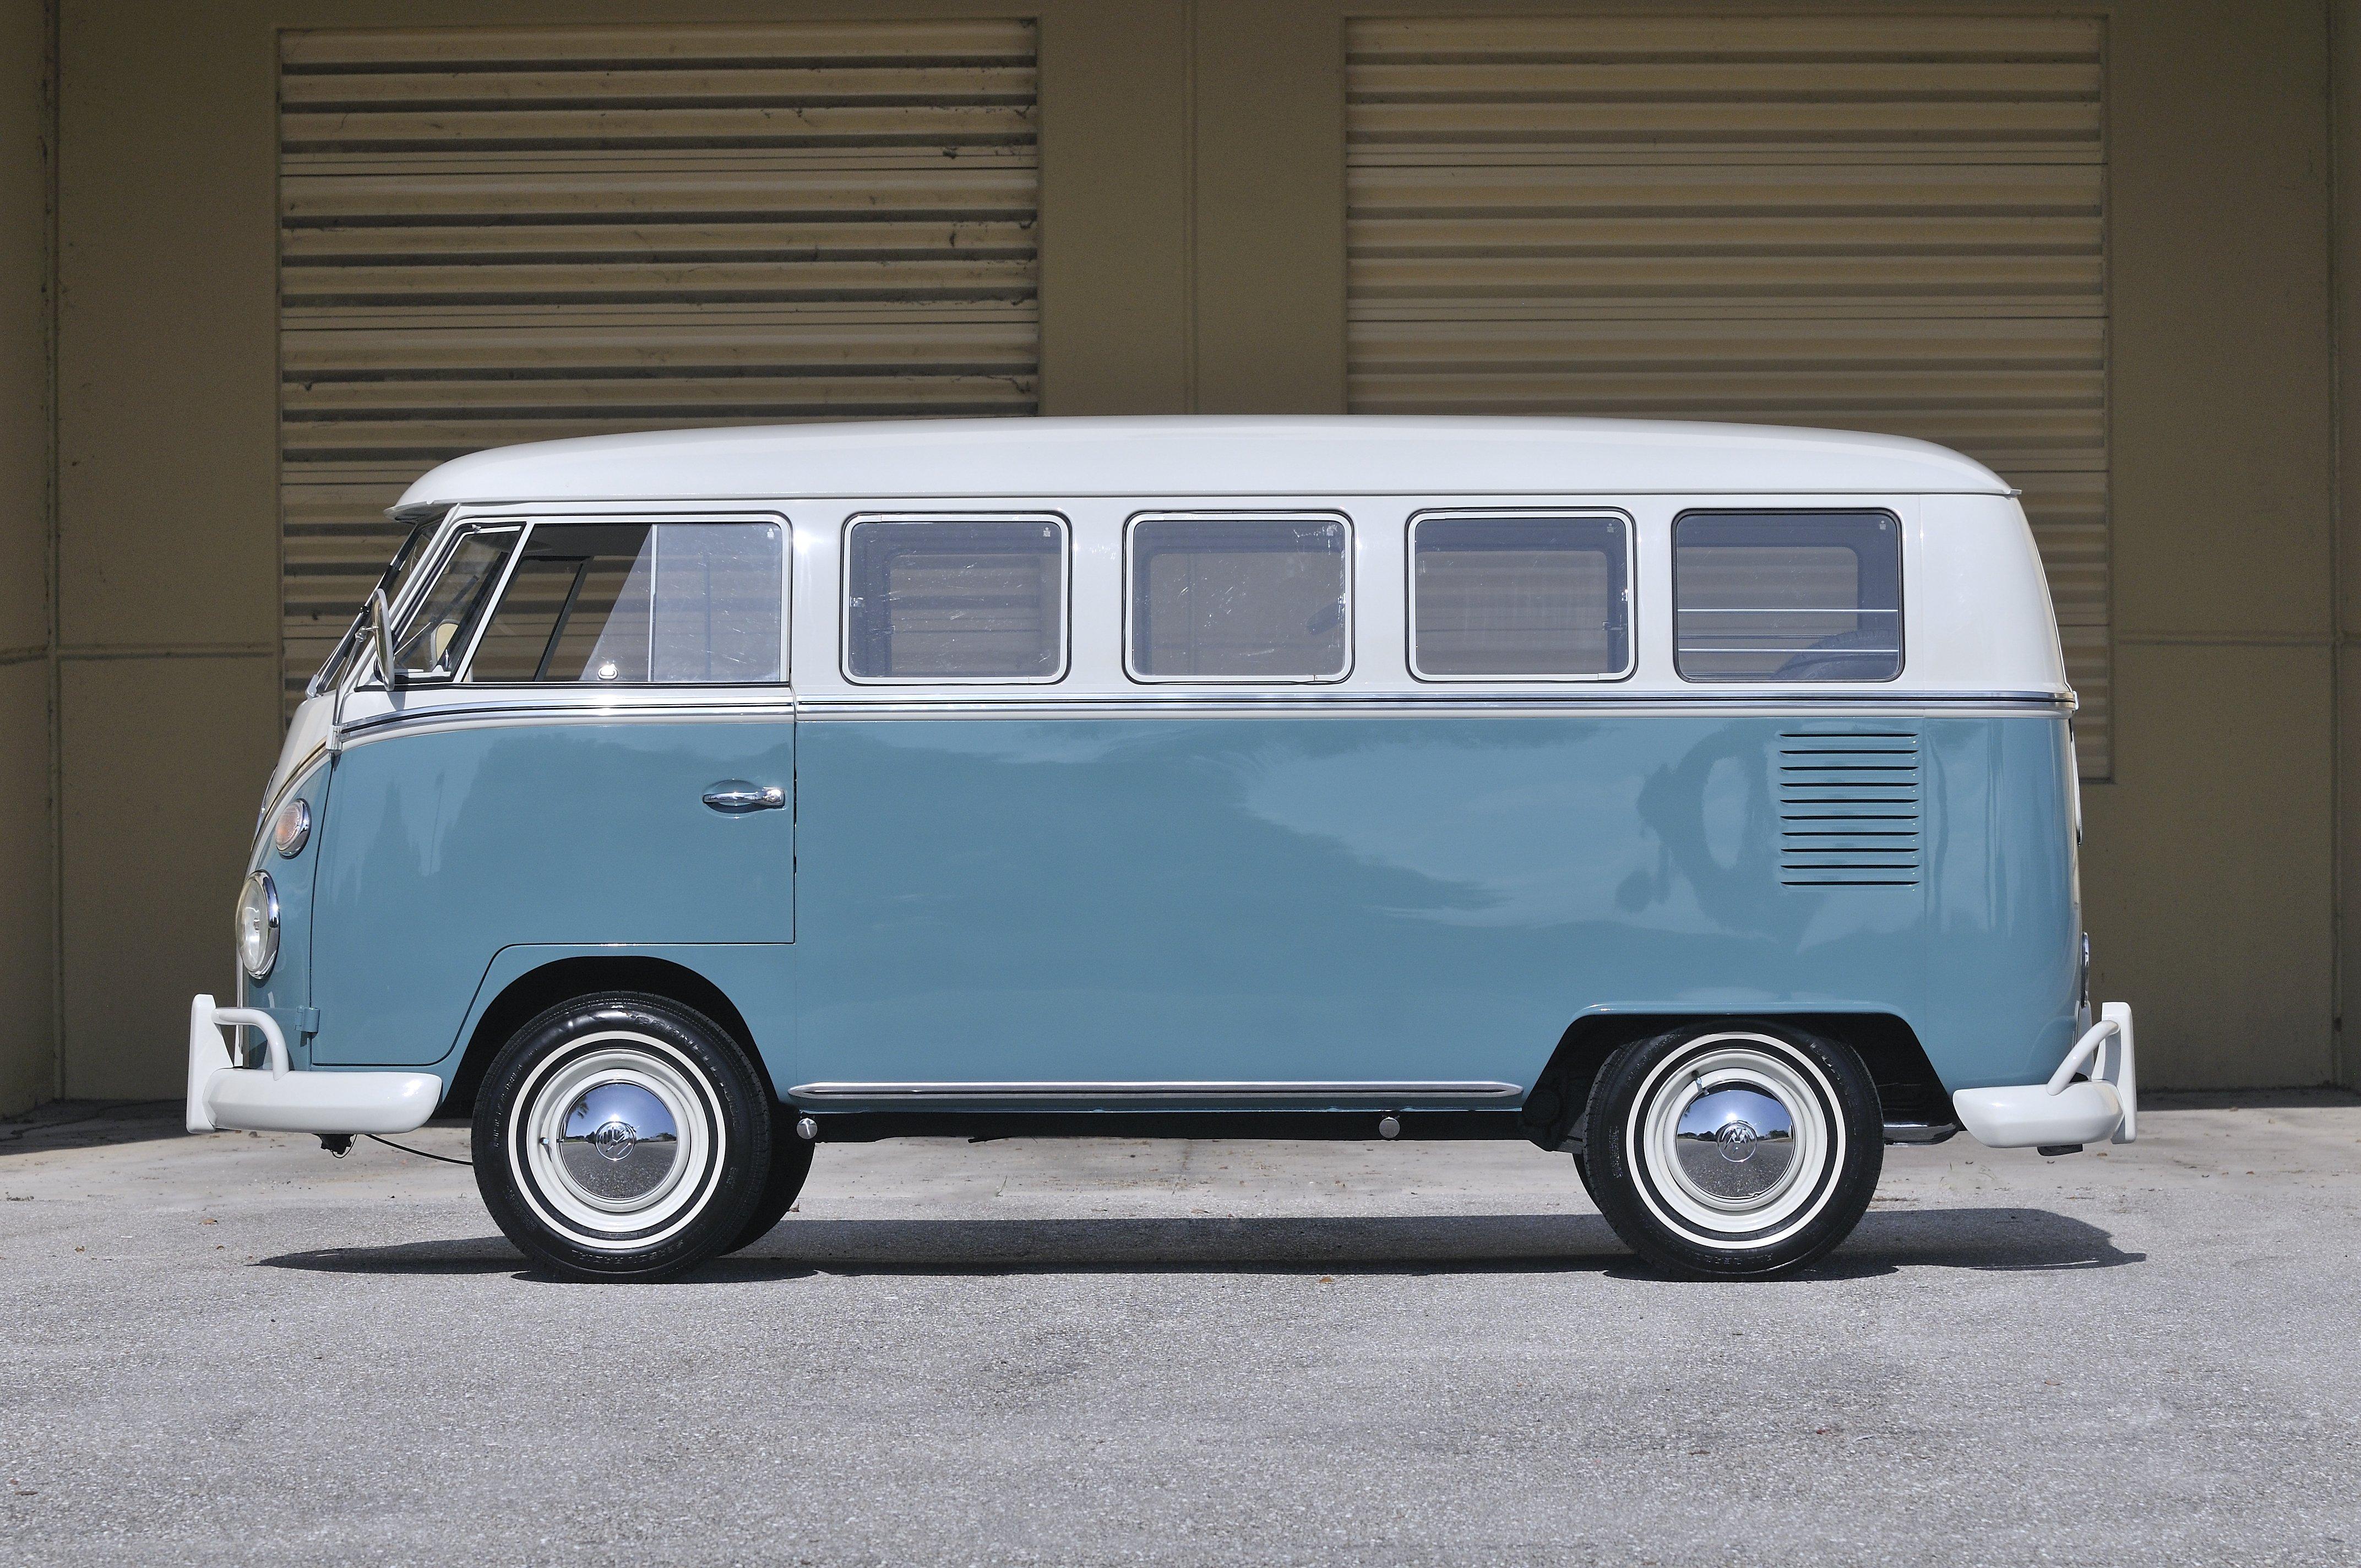 1967 volkswagen vw 13 window bus kombi classic old usa 4288x2848-06